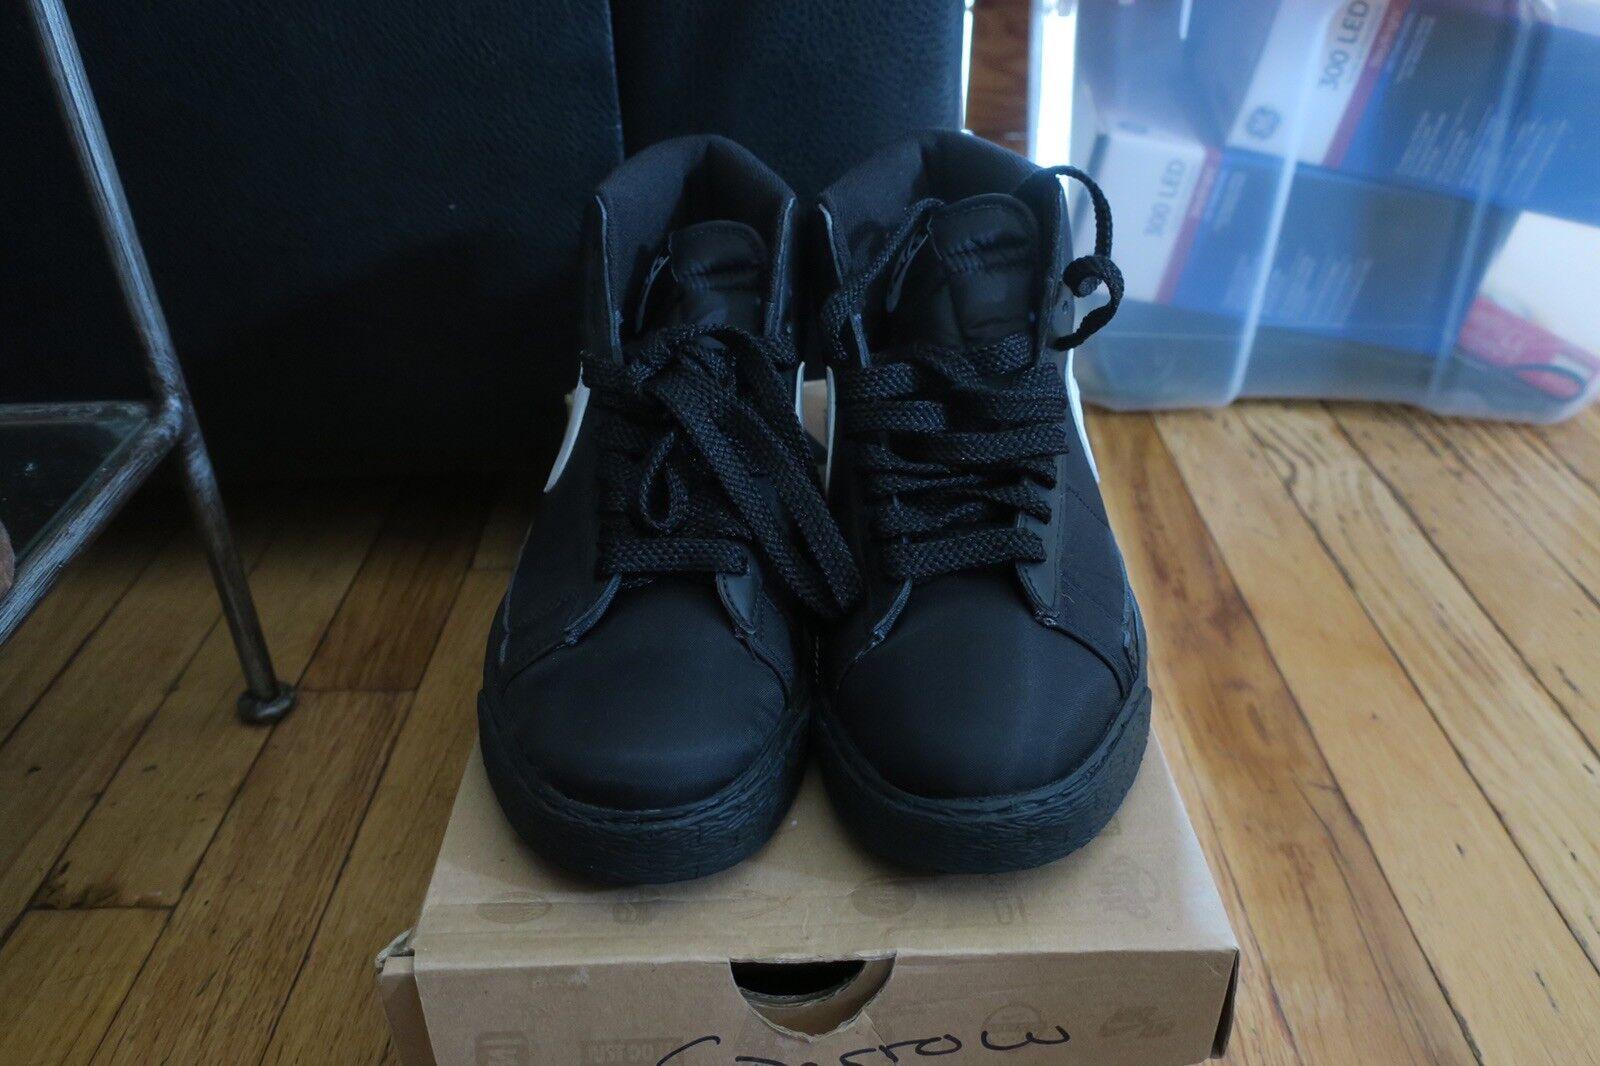 2009 Nike Blazer High Black Size 8 New, Never Worn